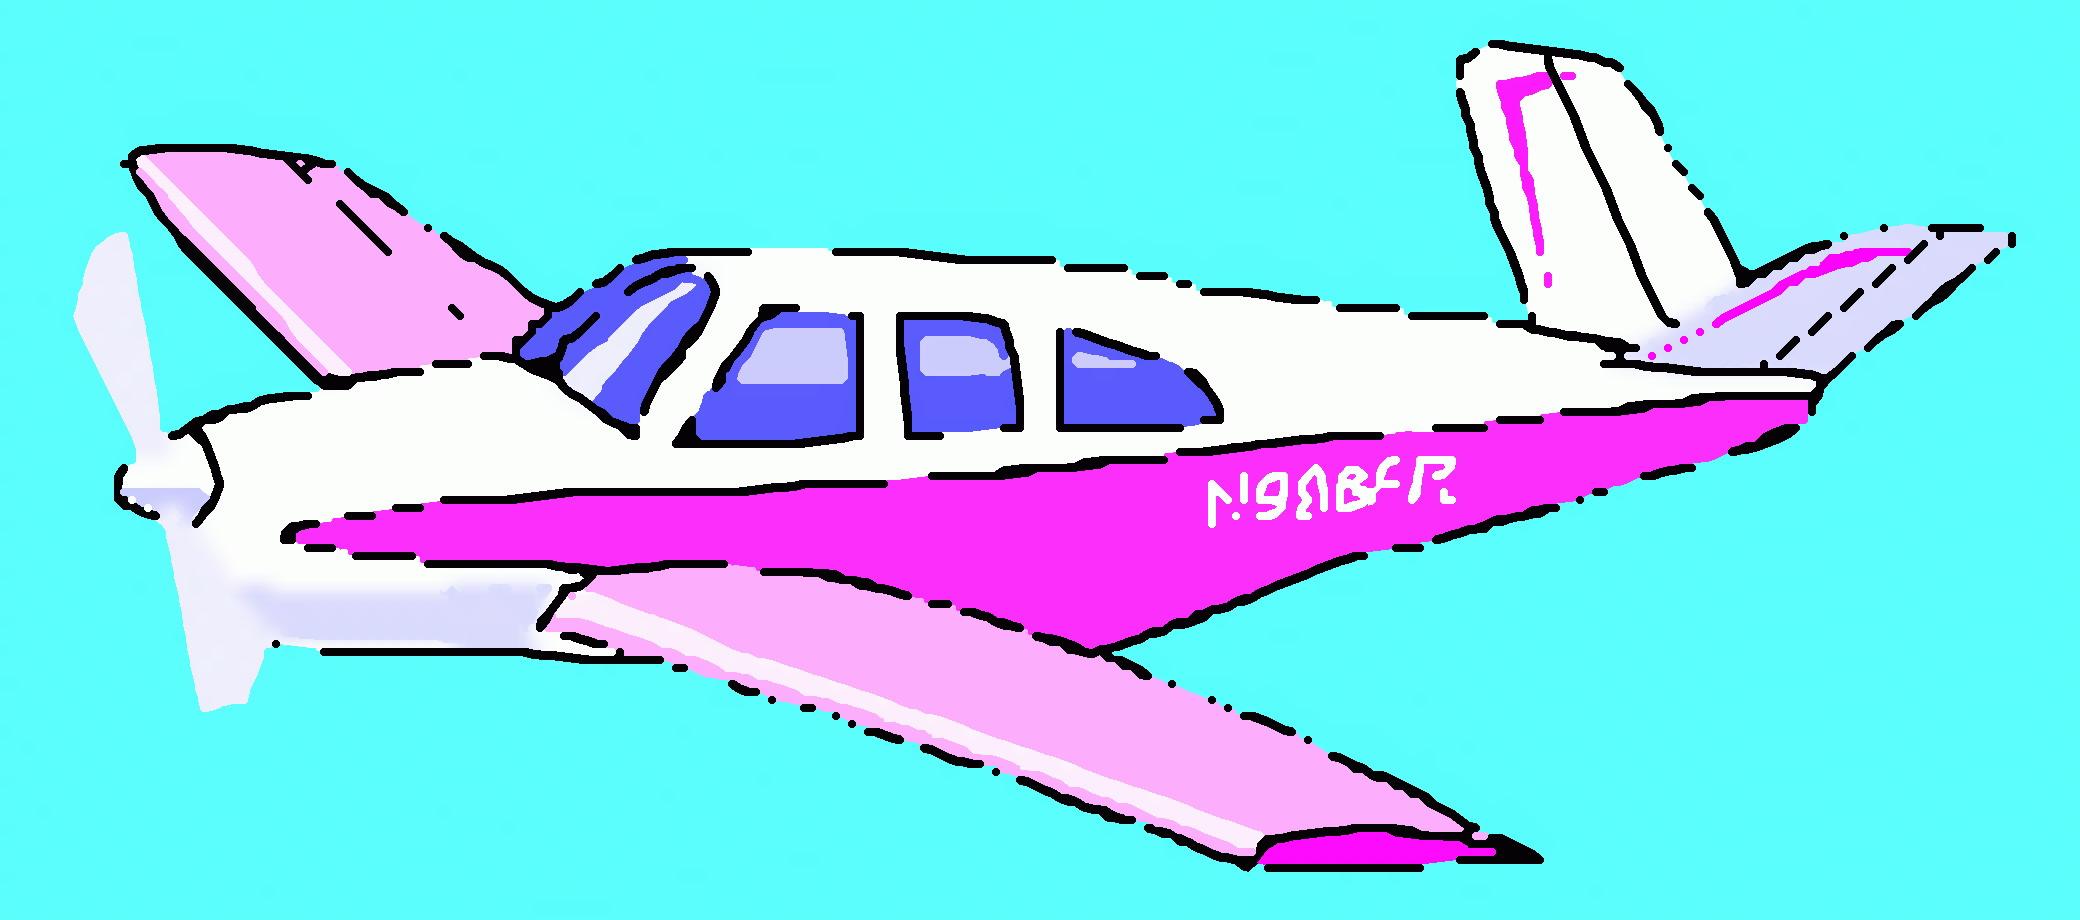 Plane Auto Electrical Wiring Diagram Interior Fuse Box Location 19922011 Mercury Grand Marquis 1999 Pixenlarge Bildvergr U00f6 U00dferungsl U00f6sung F U00fcr Eine Pixelige Welt